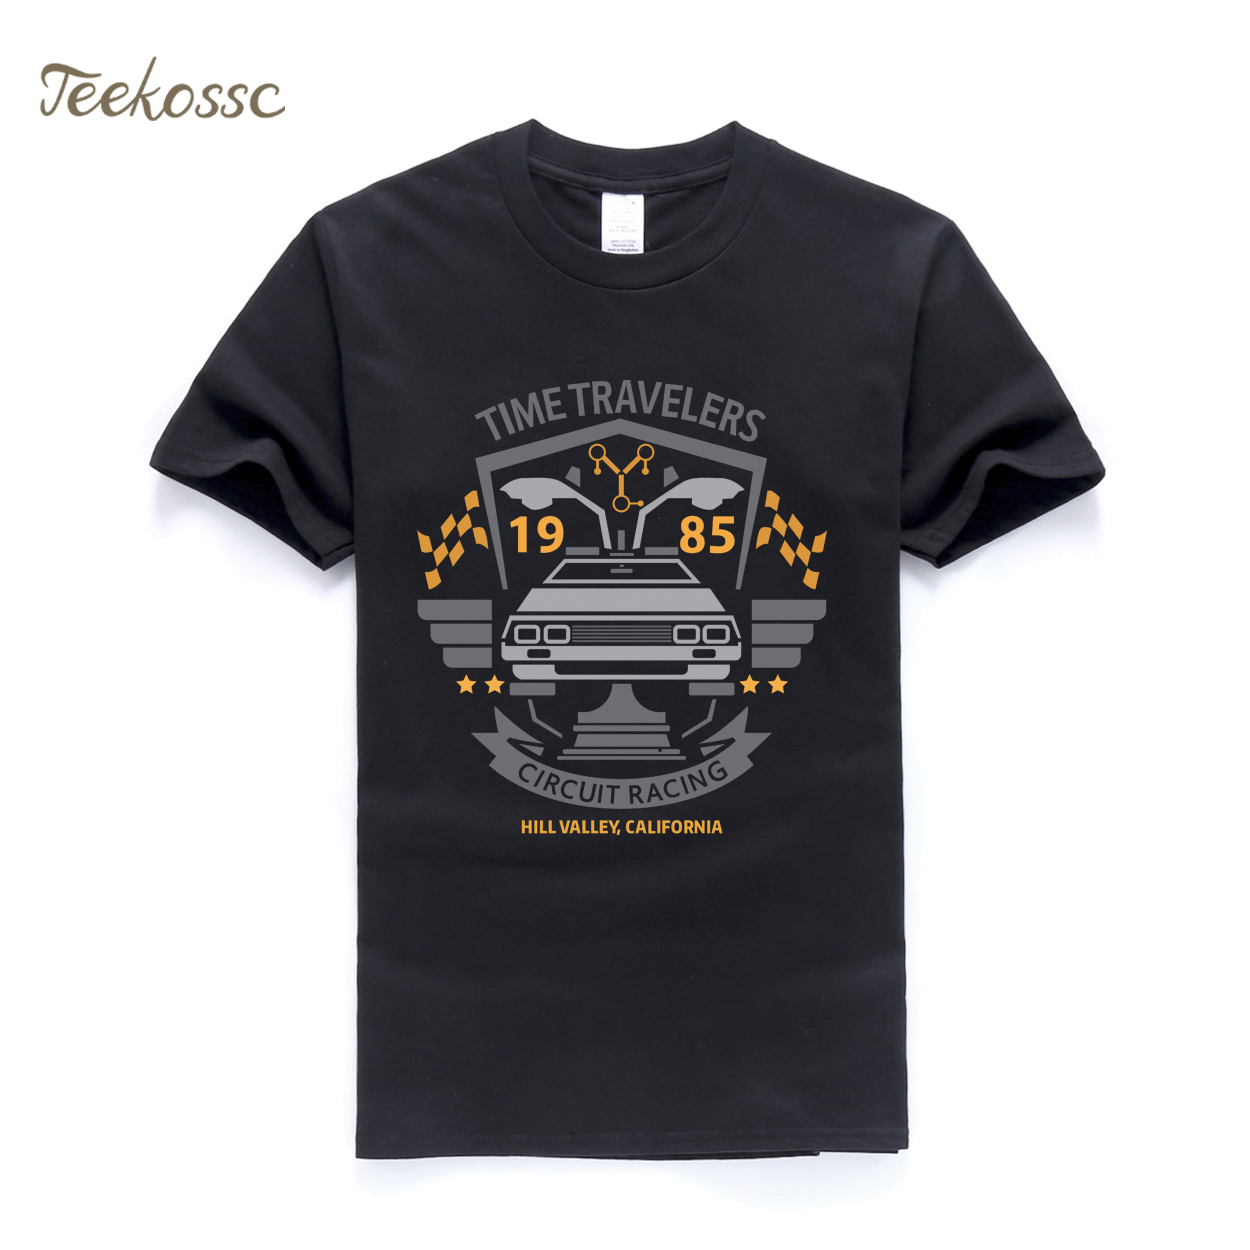 Back to the Future   T     Shirt   Men Classic Movie Series   T     Shirts   Mens 2018 New Summer   T     Shirts   Camiseta Casual   T  -  Shirt   Tops Tee XXXL